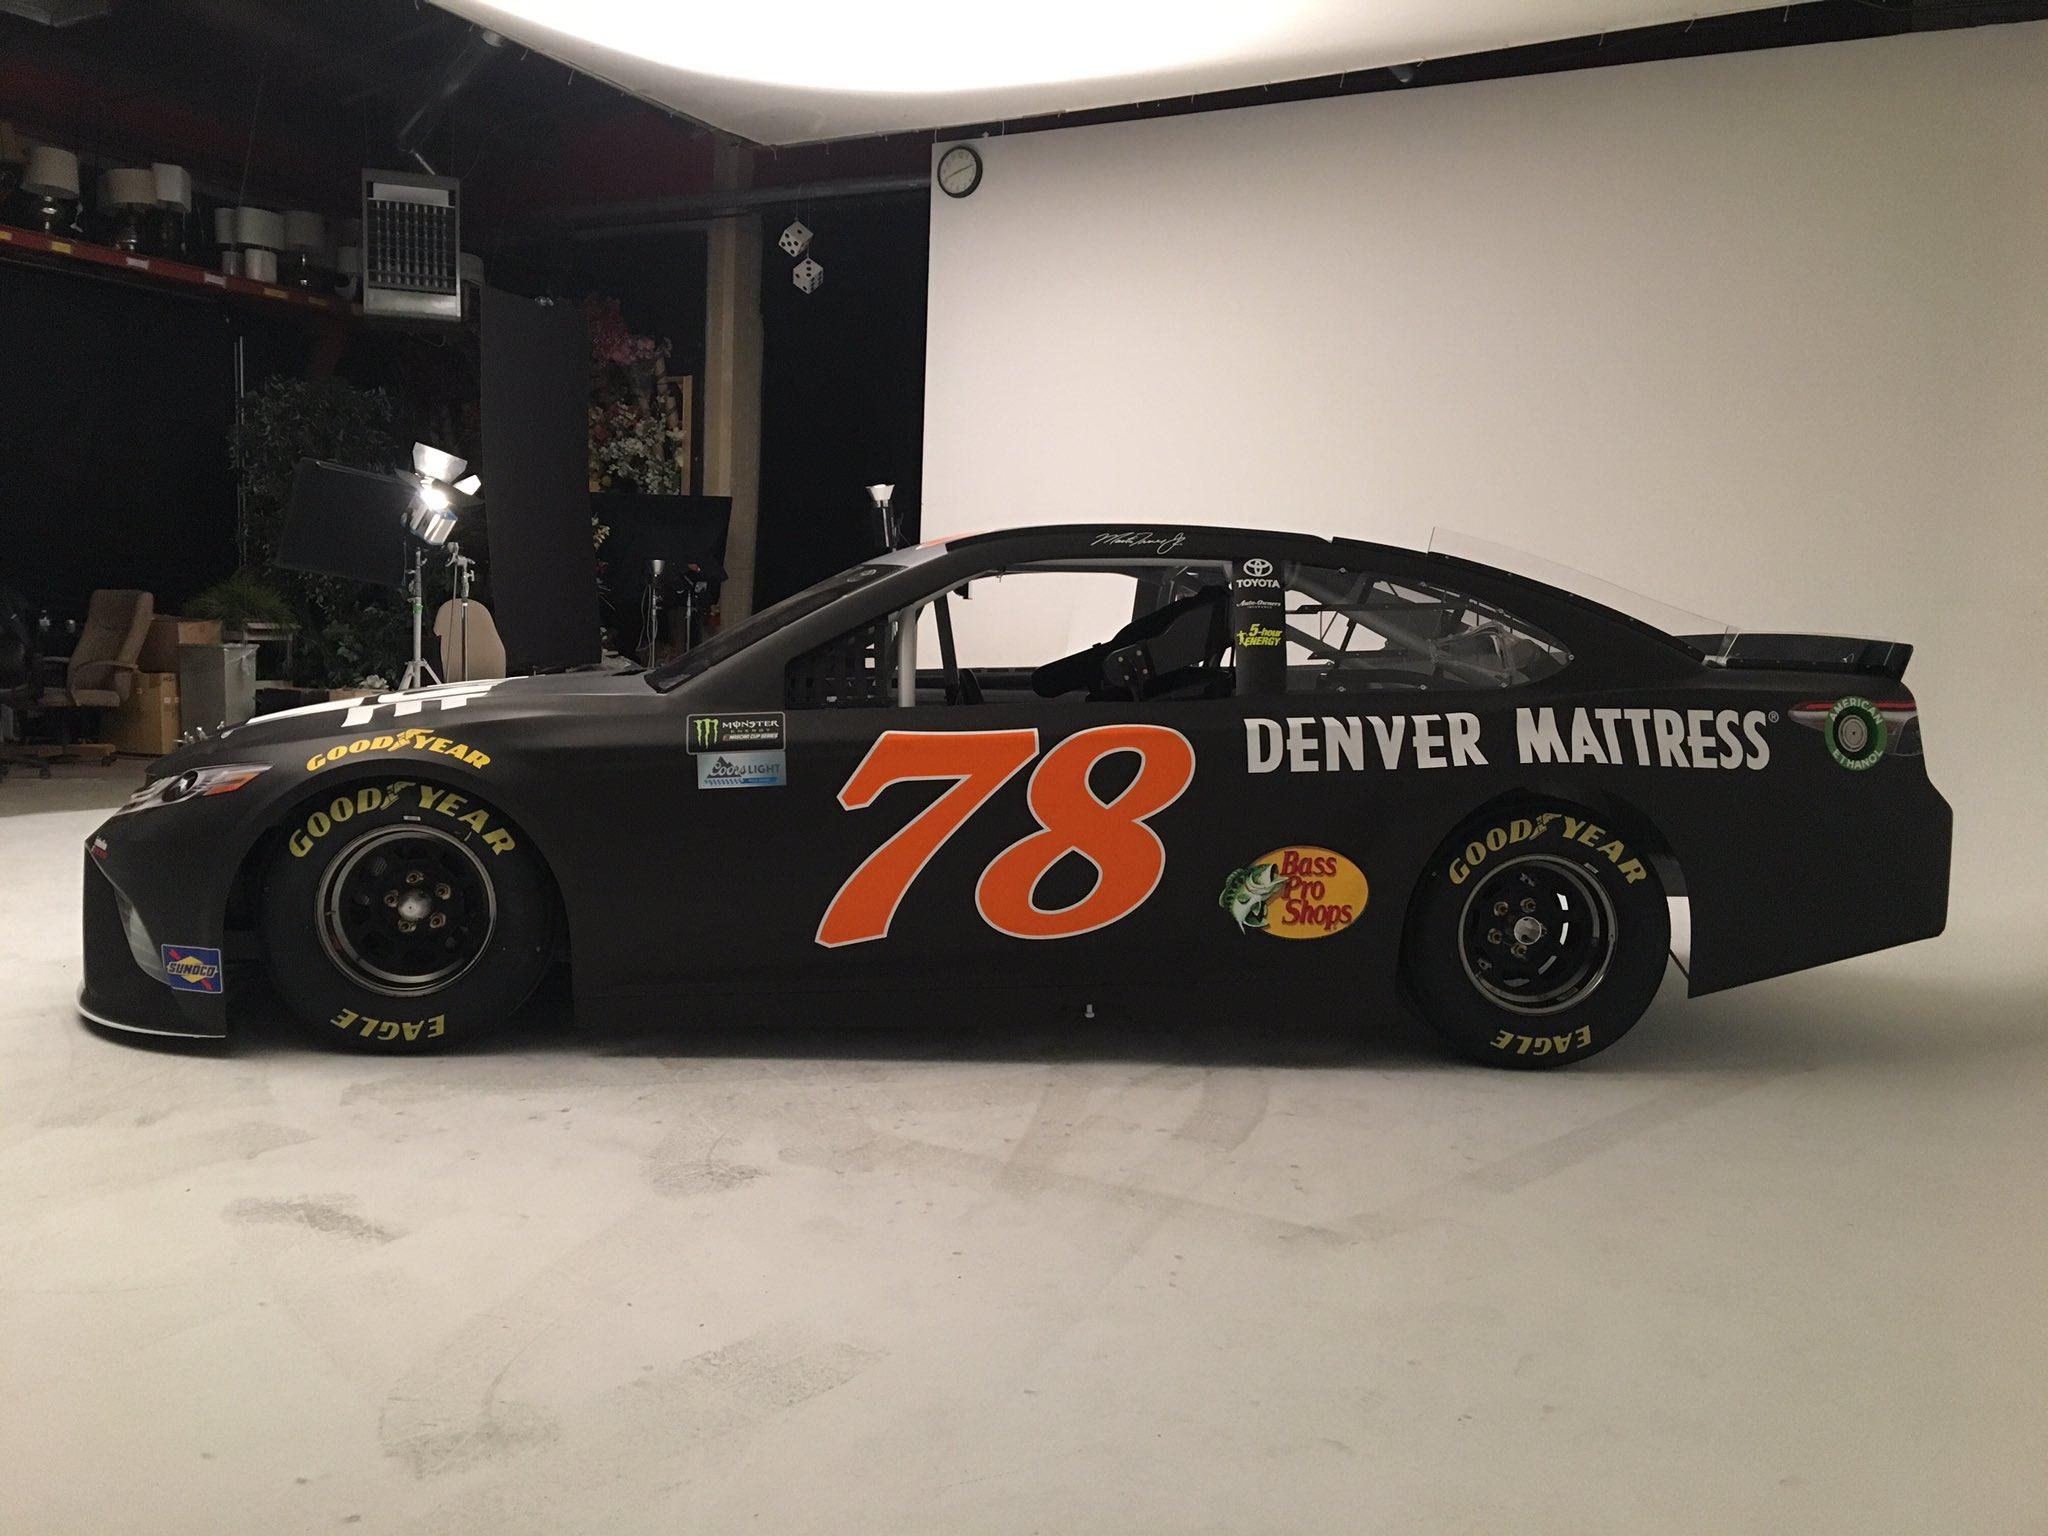 Martin Truex Jr 2017 Auto-owners Insurance Paint Scheme - Race Car , HD Wallpaper & Backgrounds